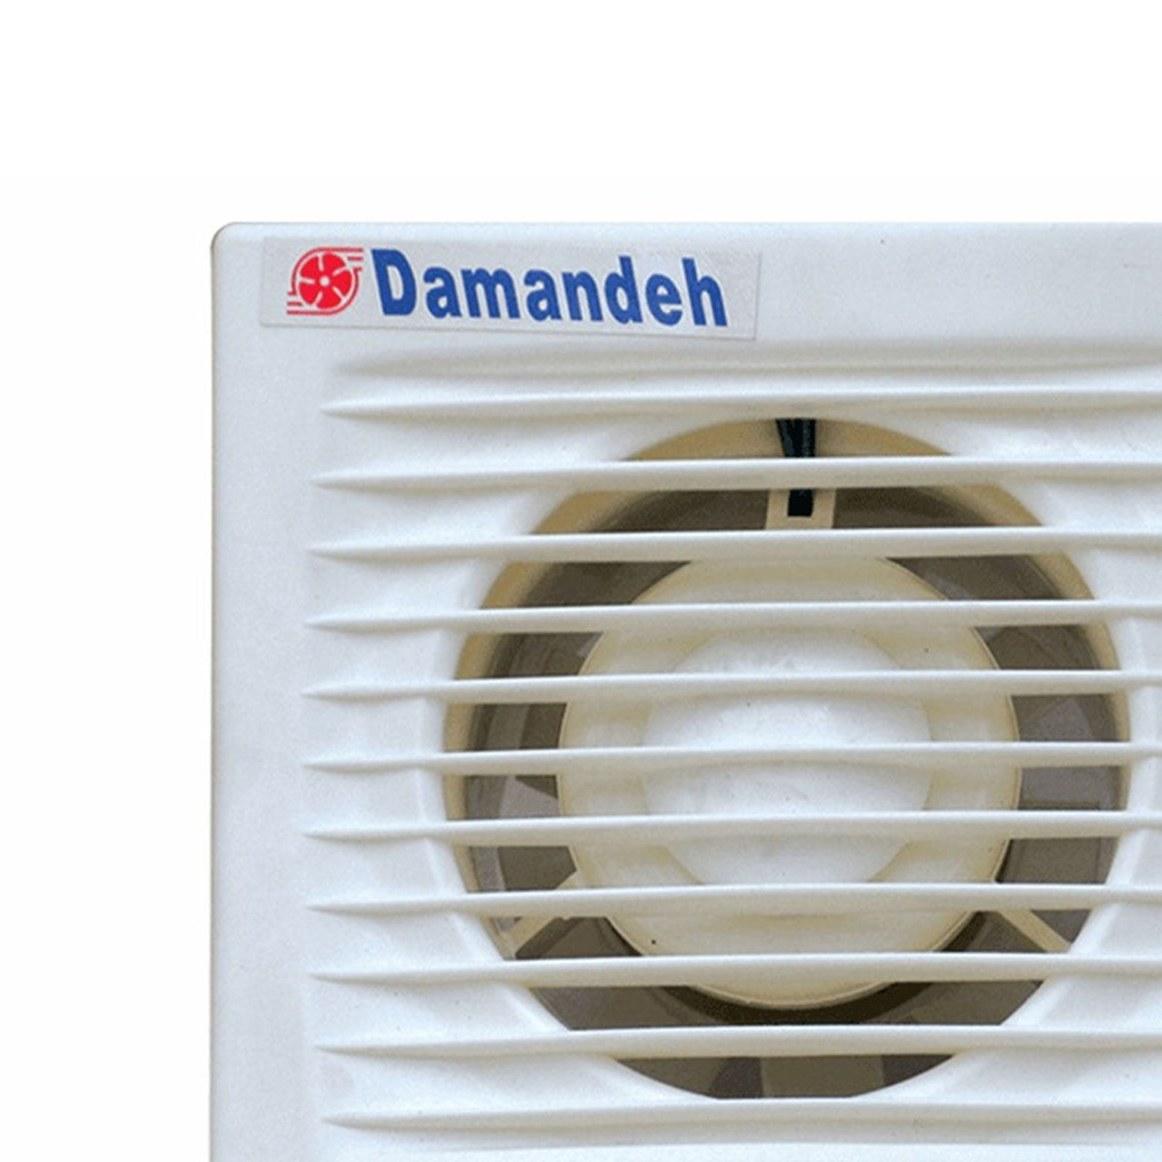 تصویر هواکش دمنده 8 سانتی توربو  مدل VPH-8S2S Damandeh VPH-8S2S Turbo Series Pipe Mount Fan